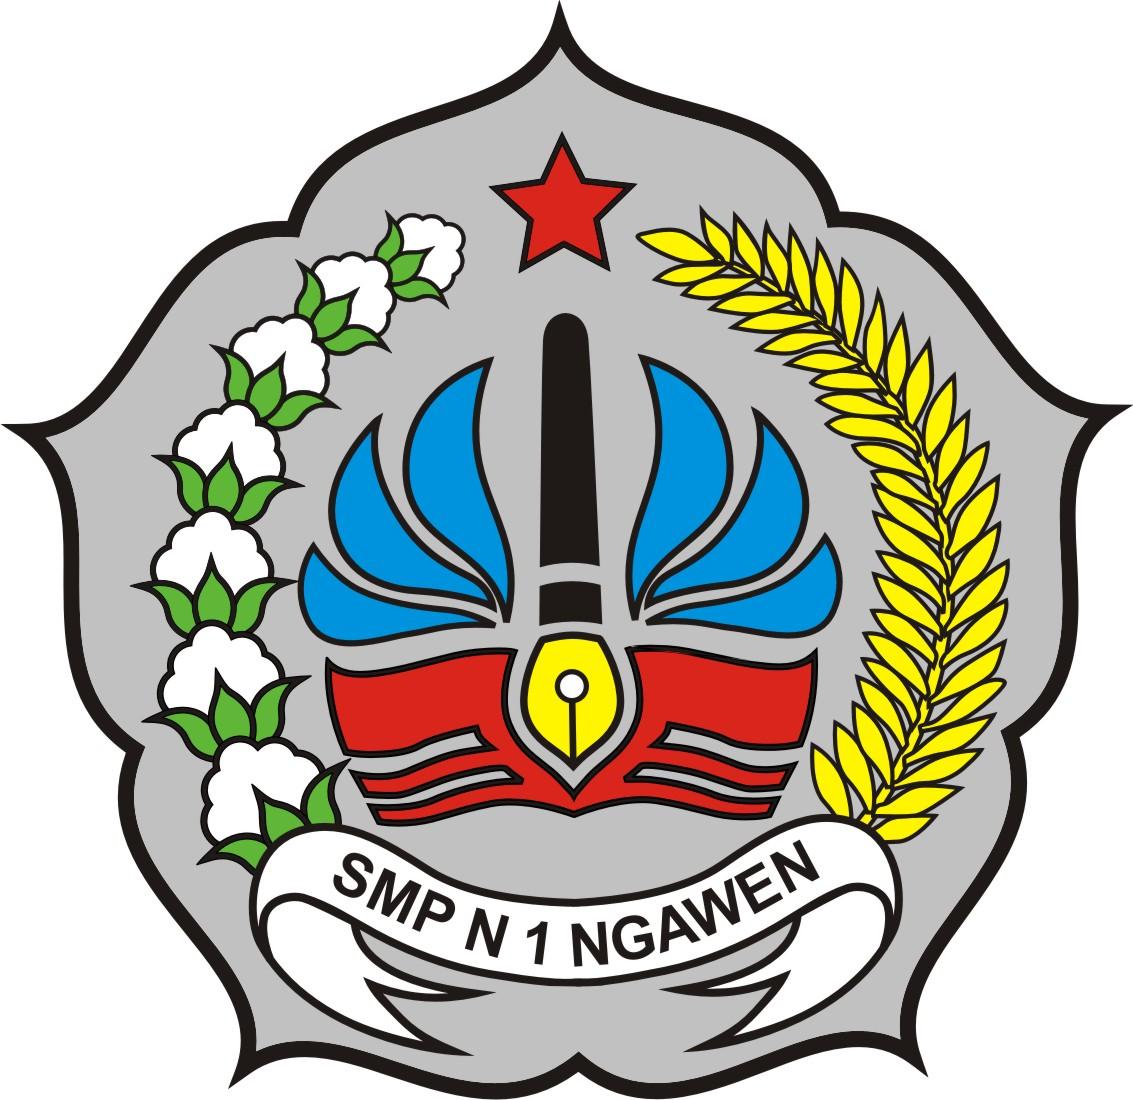 SMP Negeri 1 Ngawen Wikipedia bahasa Indonesia